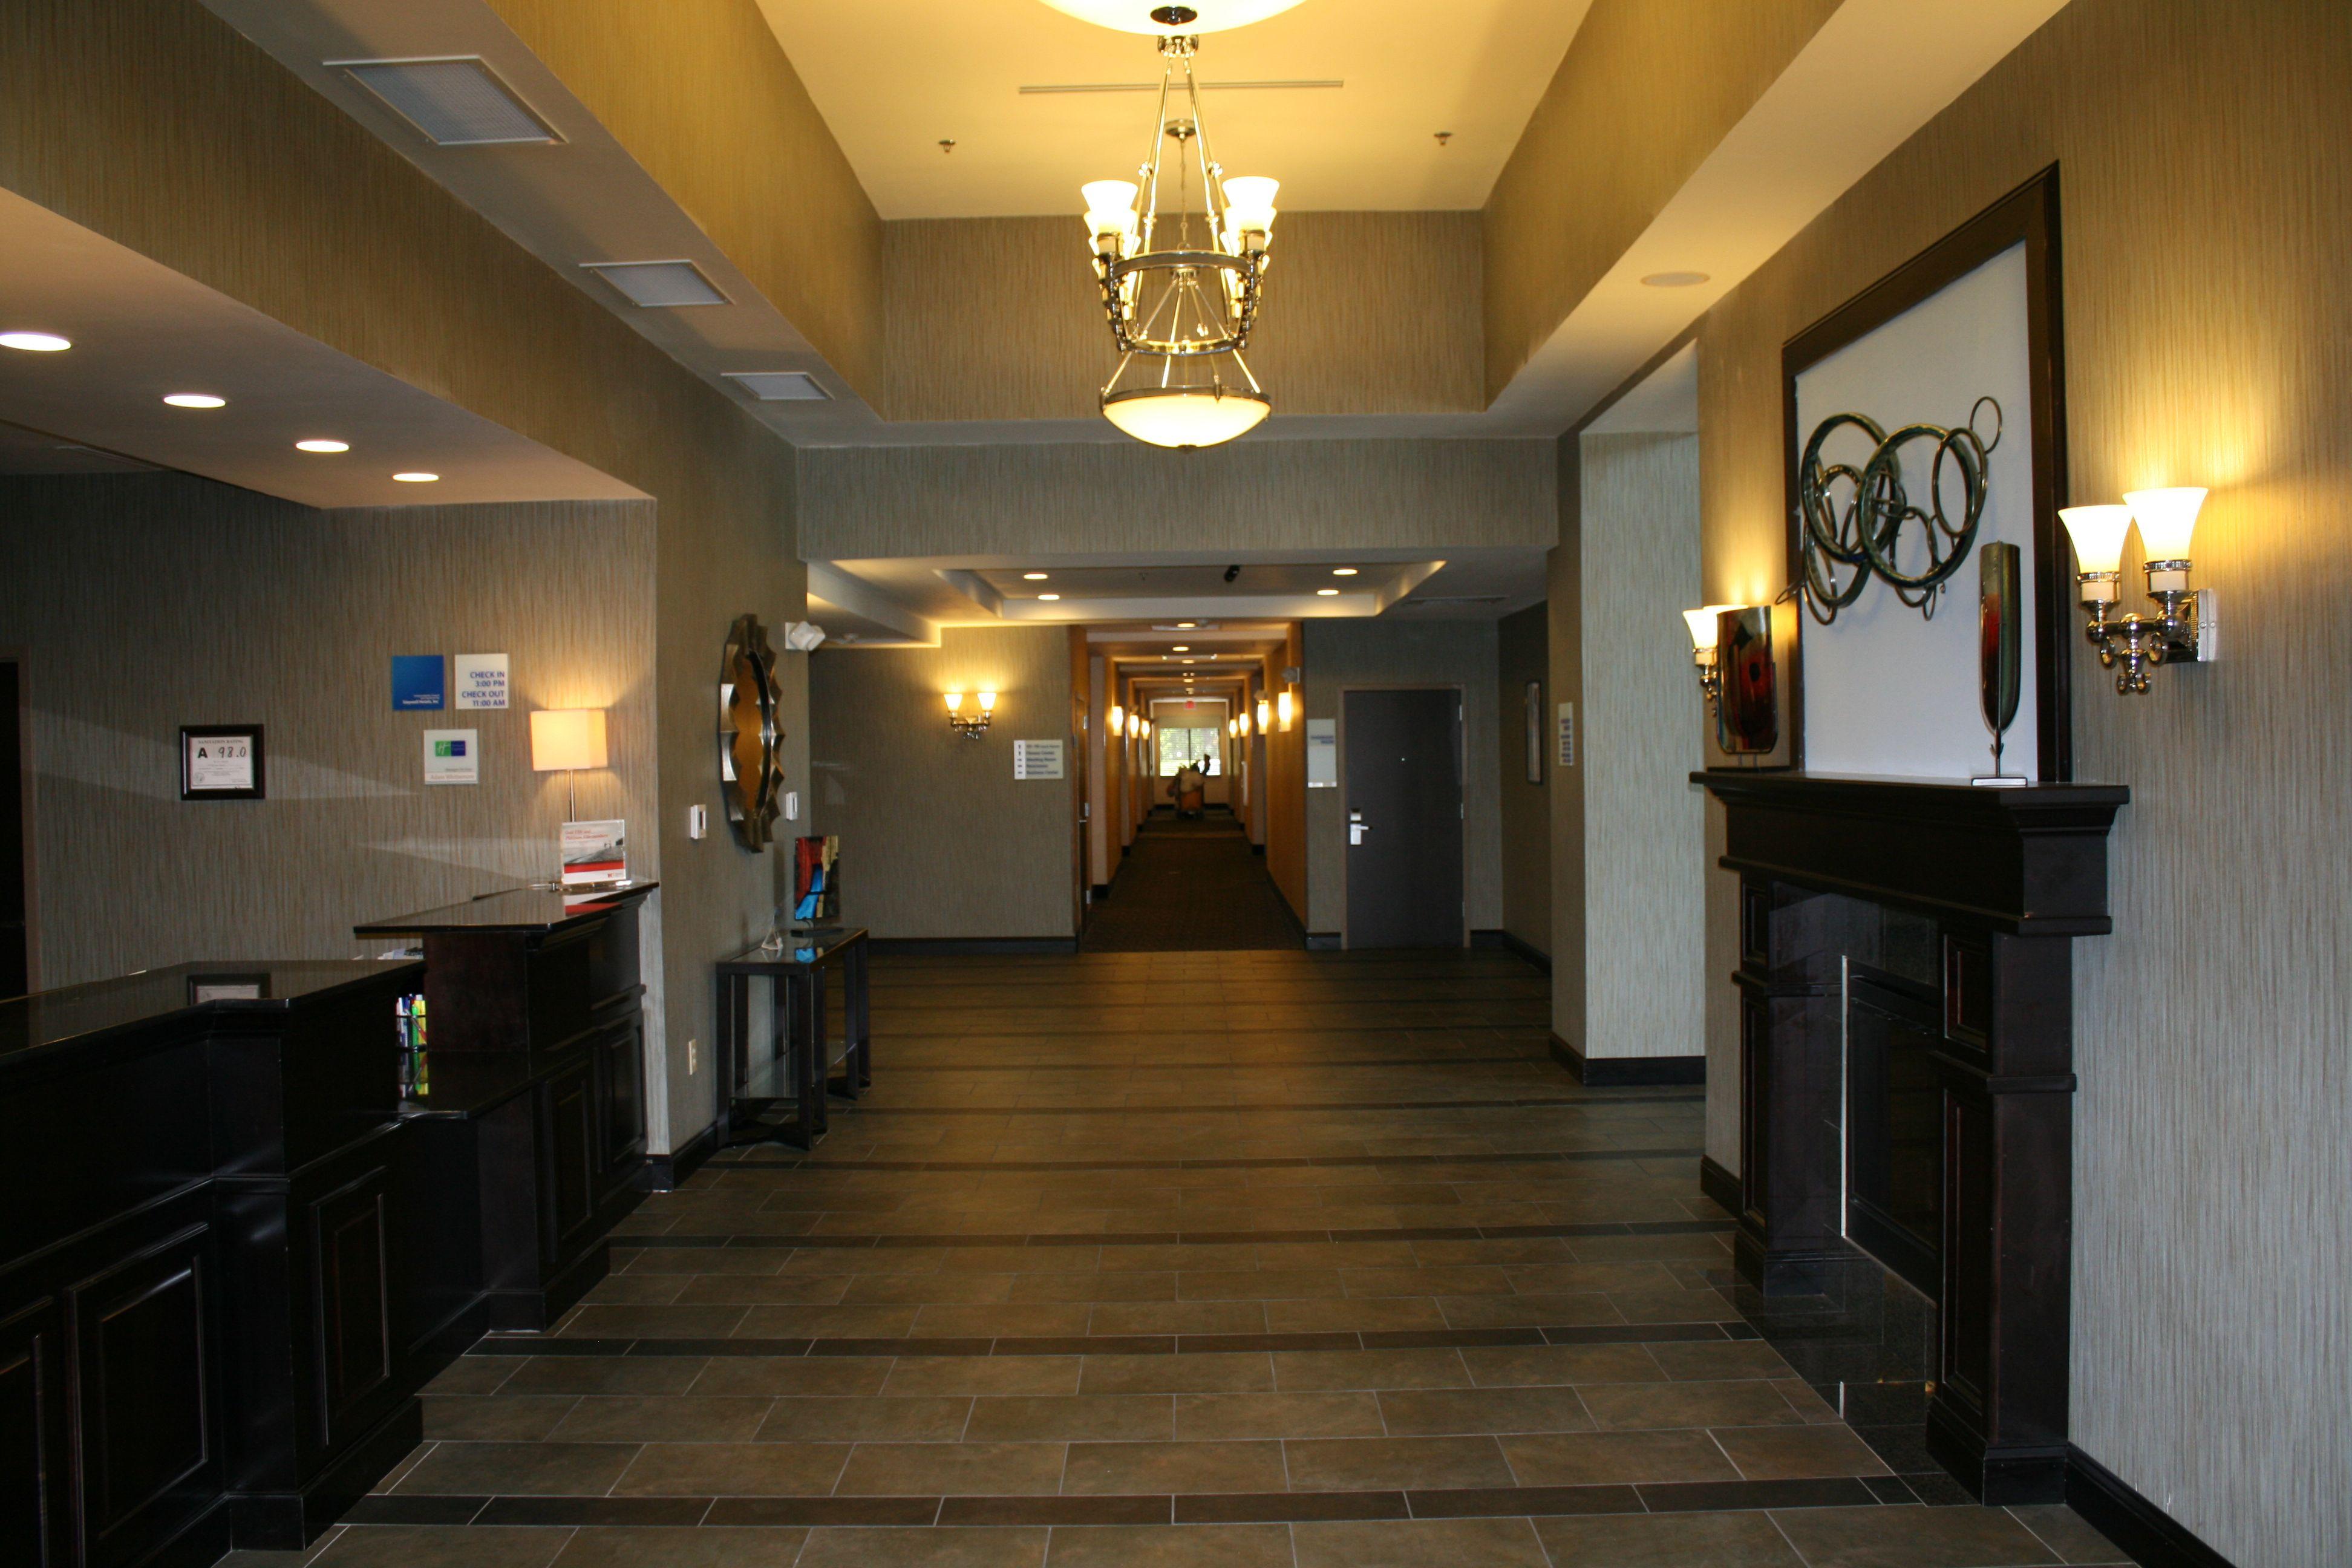 Holiday Inn Express Rockingham image 1